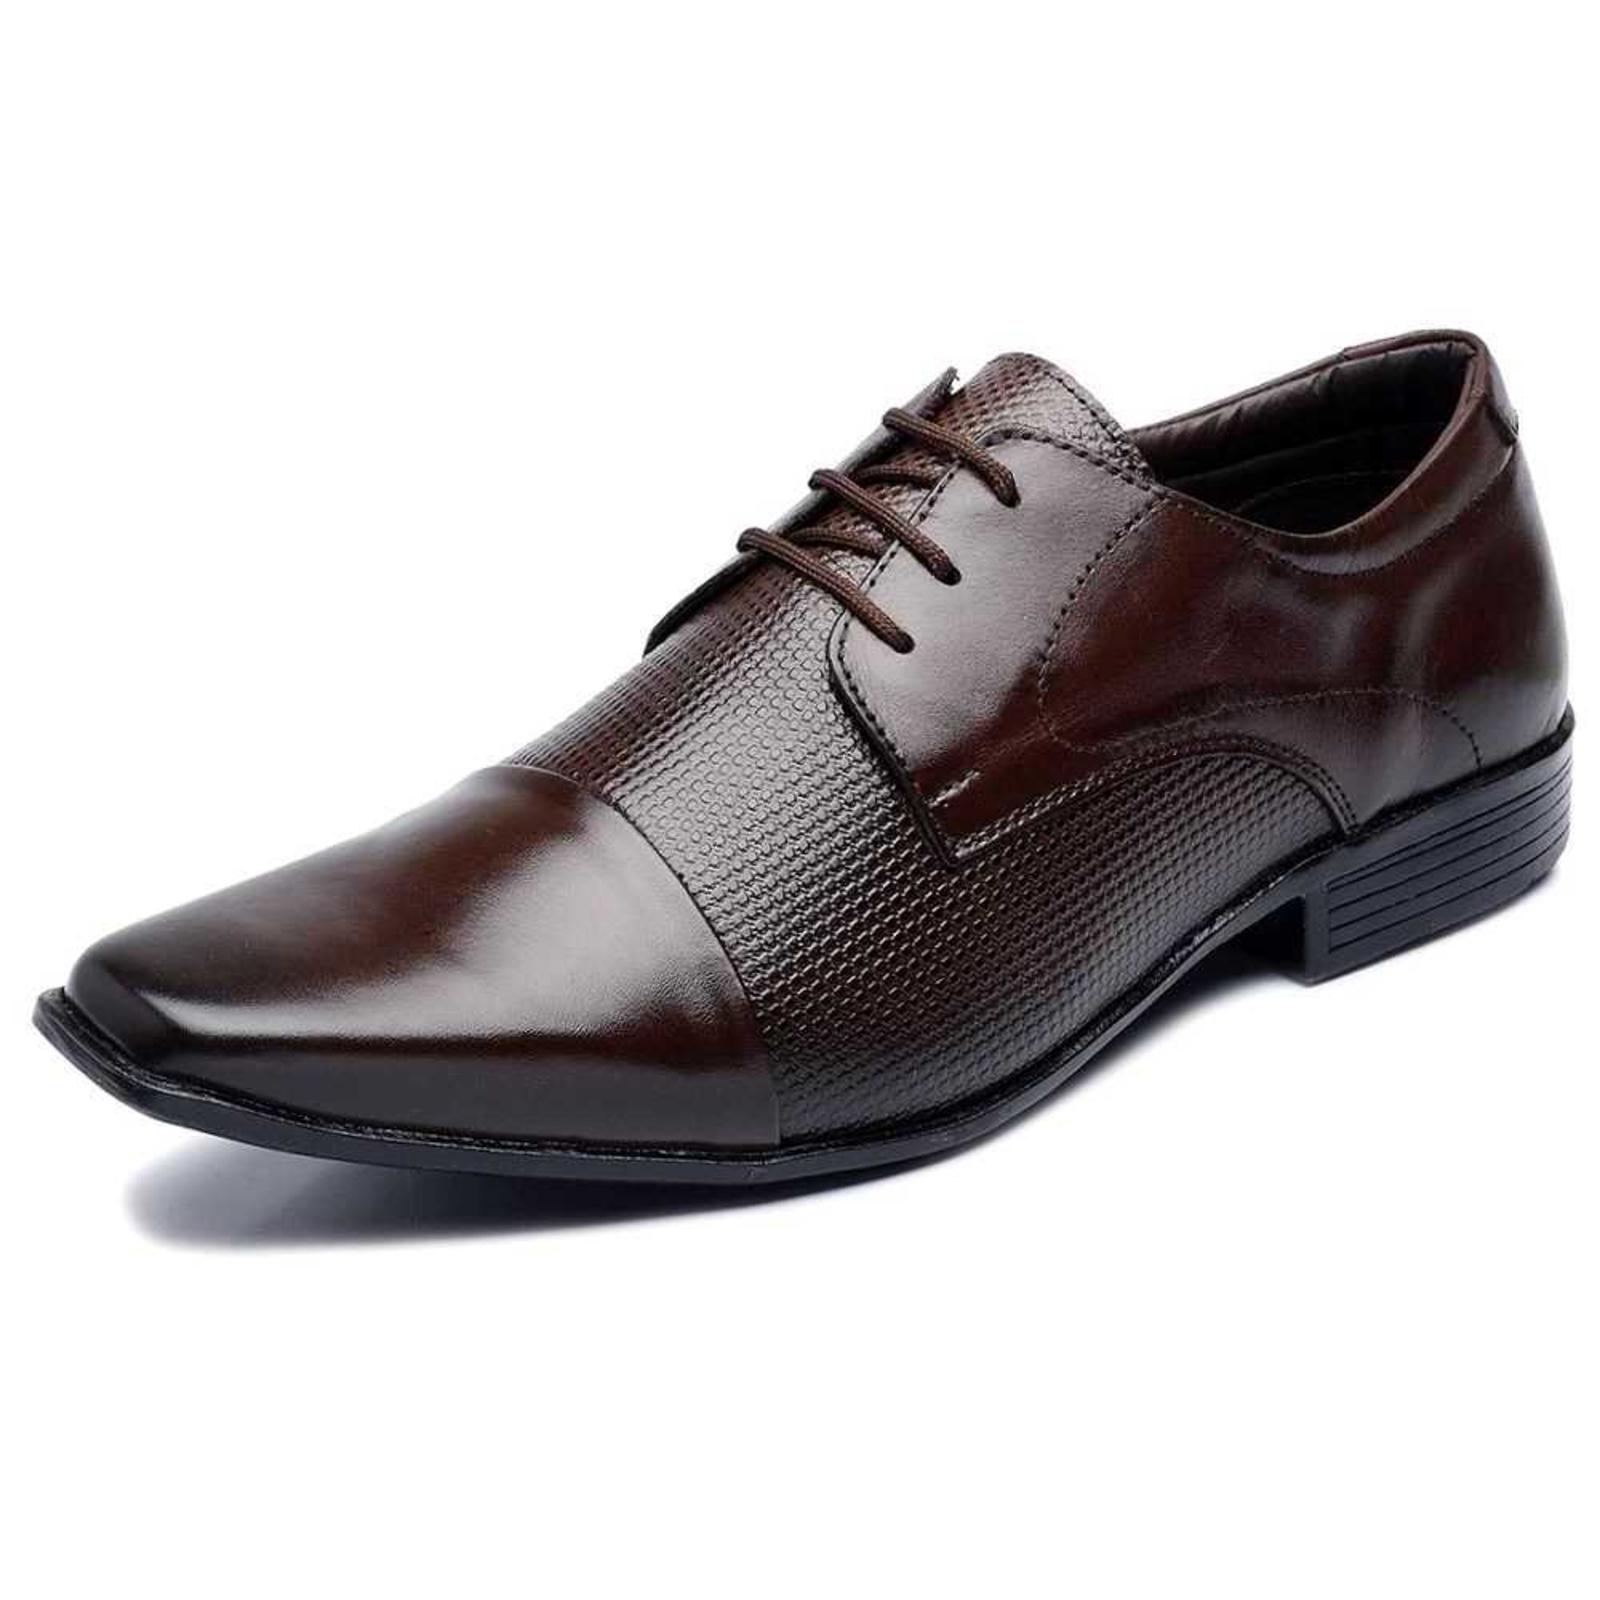 Sapatos masculinos mais estilosos e Sapatos Marcos